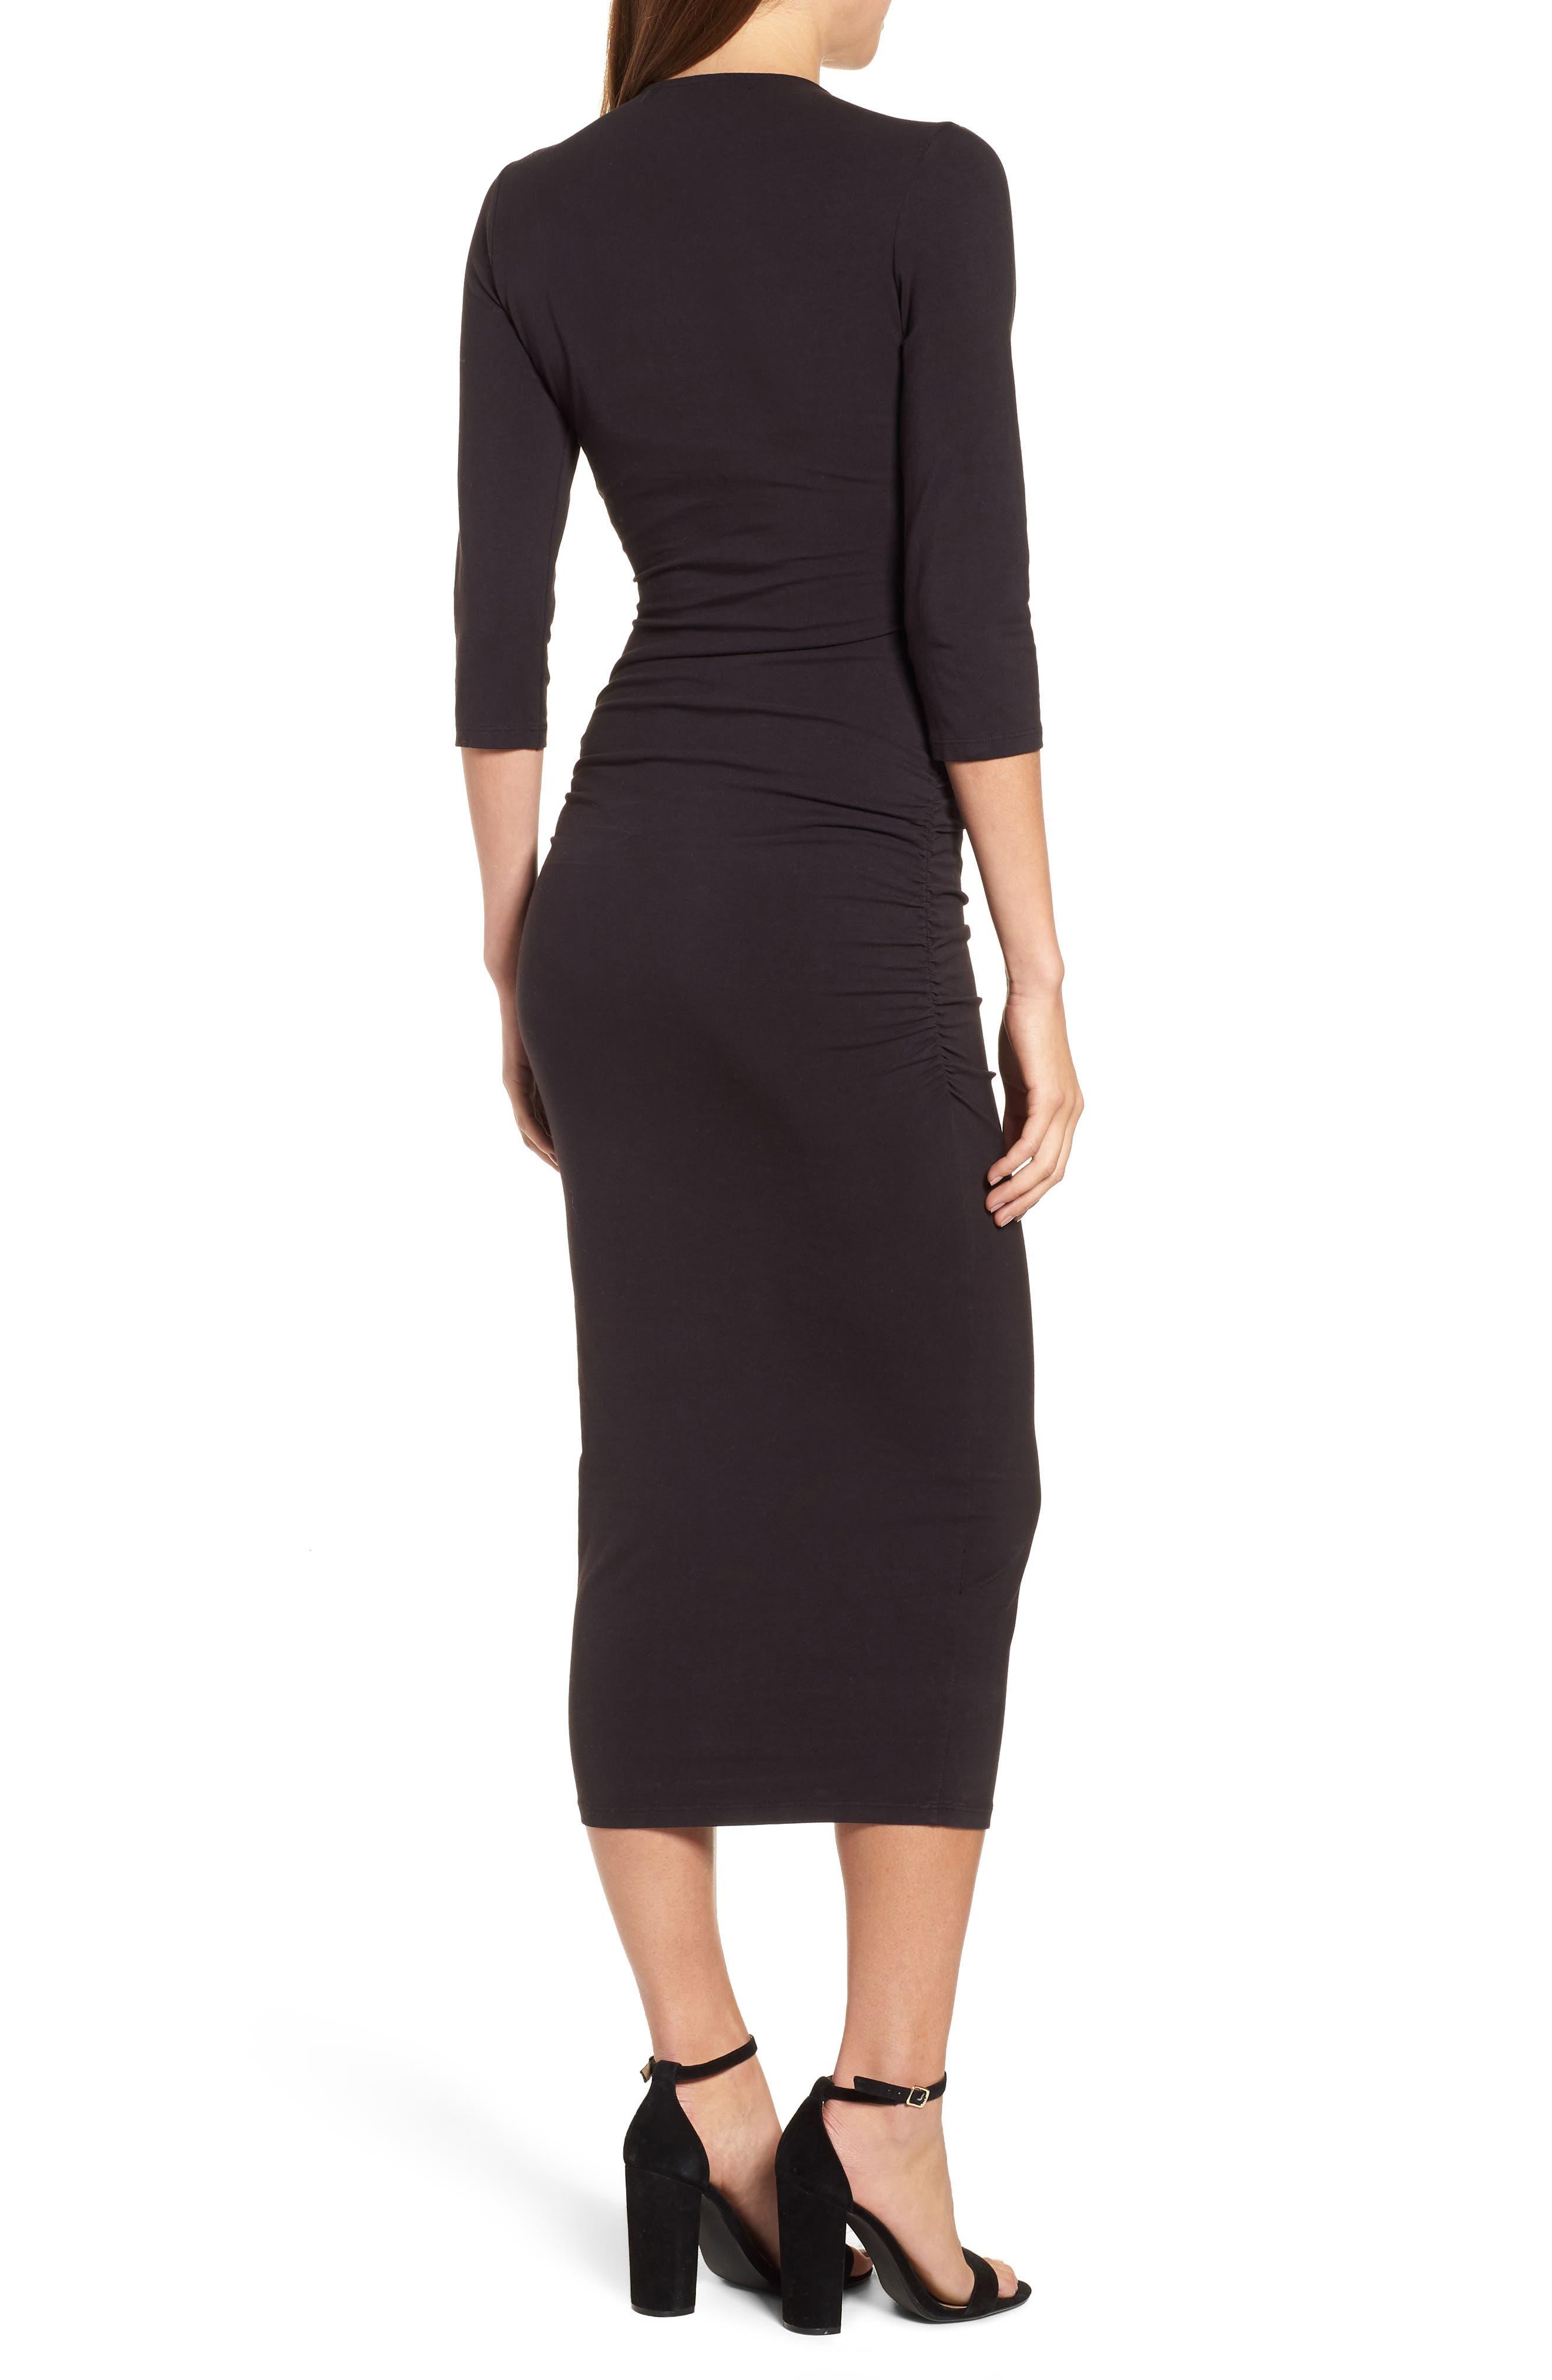 MICHAEL STARS,                             Ruched Surplice Stretch Cotton Body-Con Dress,                             Alternate thumbnail 2, color,                             001